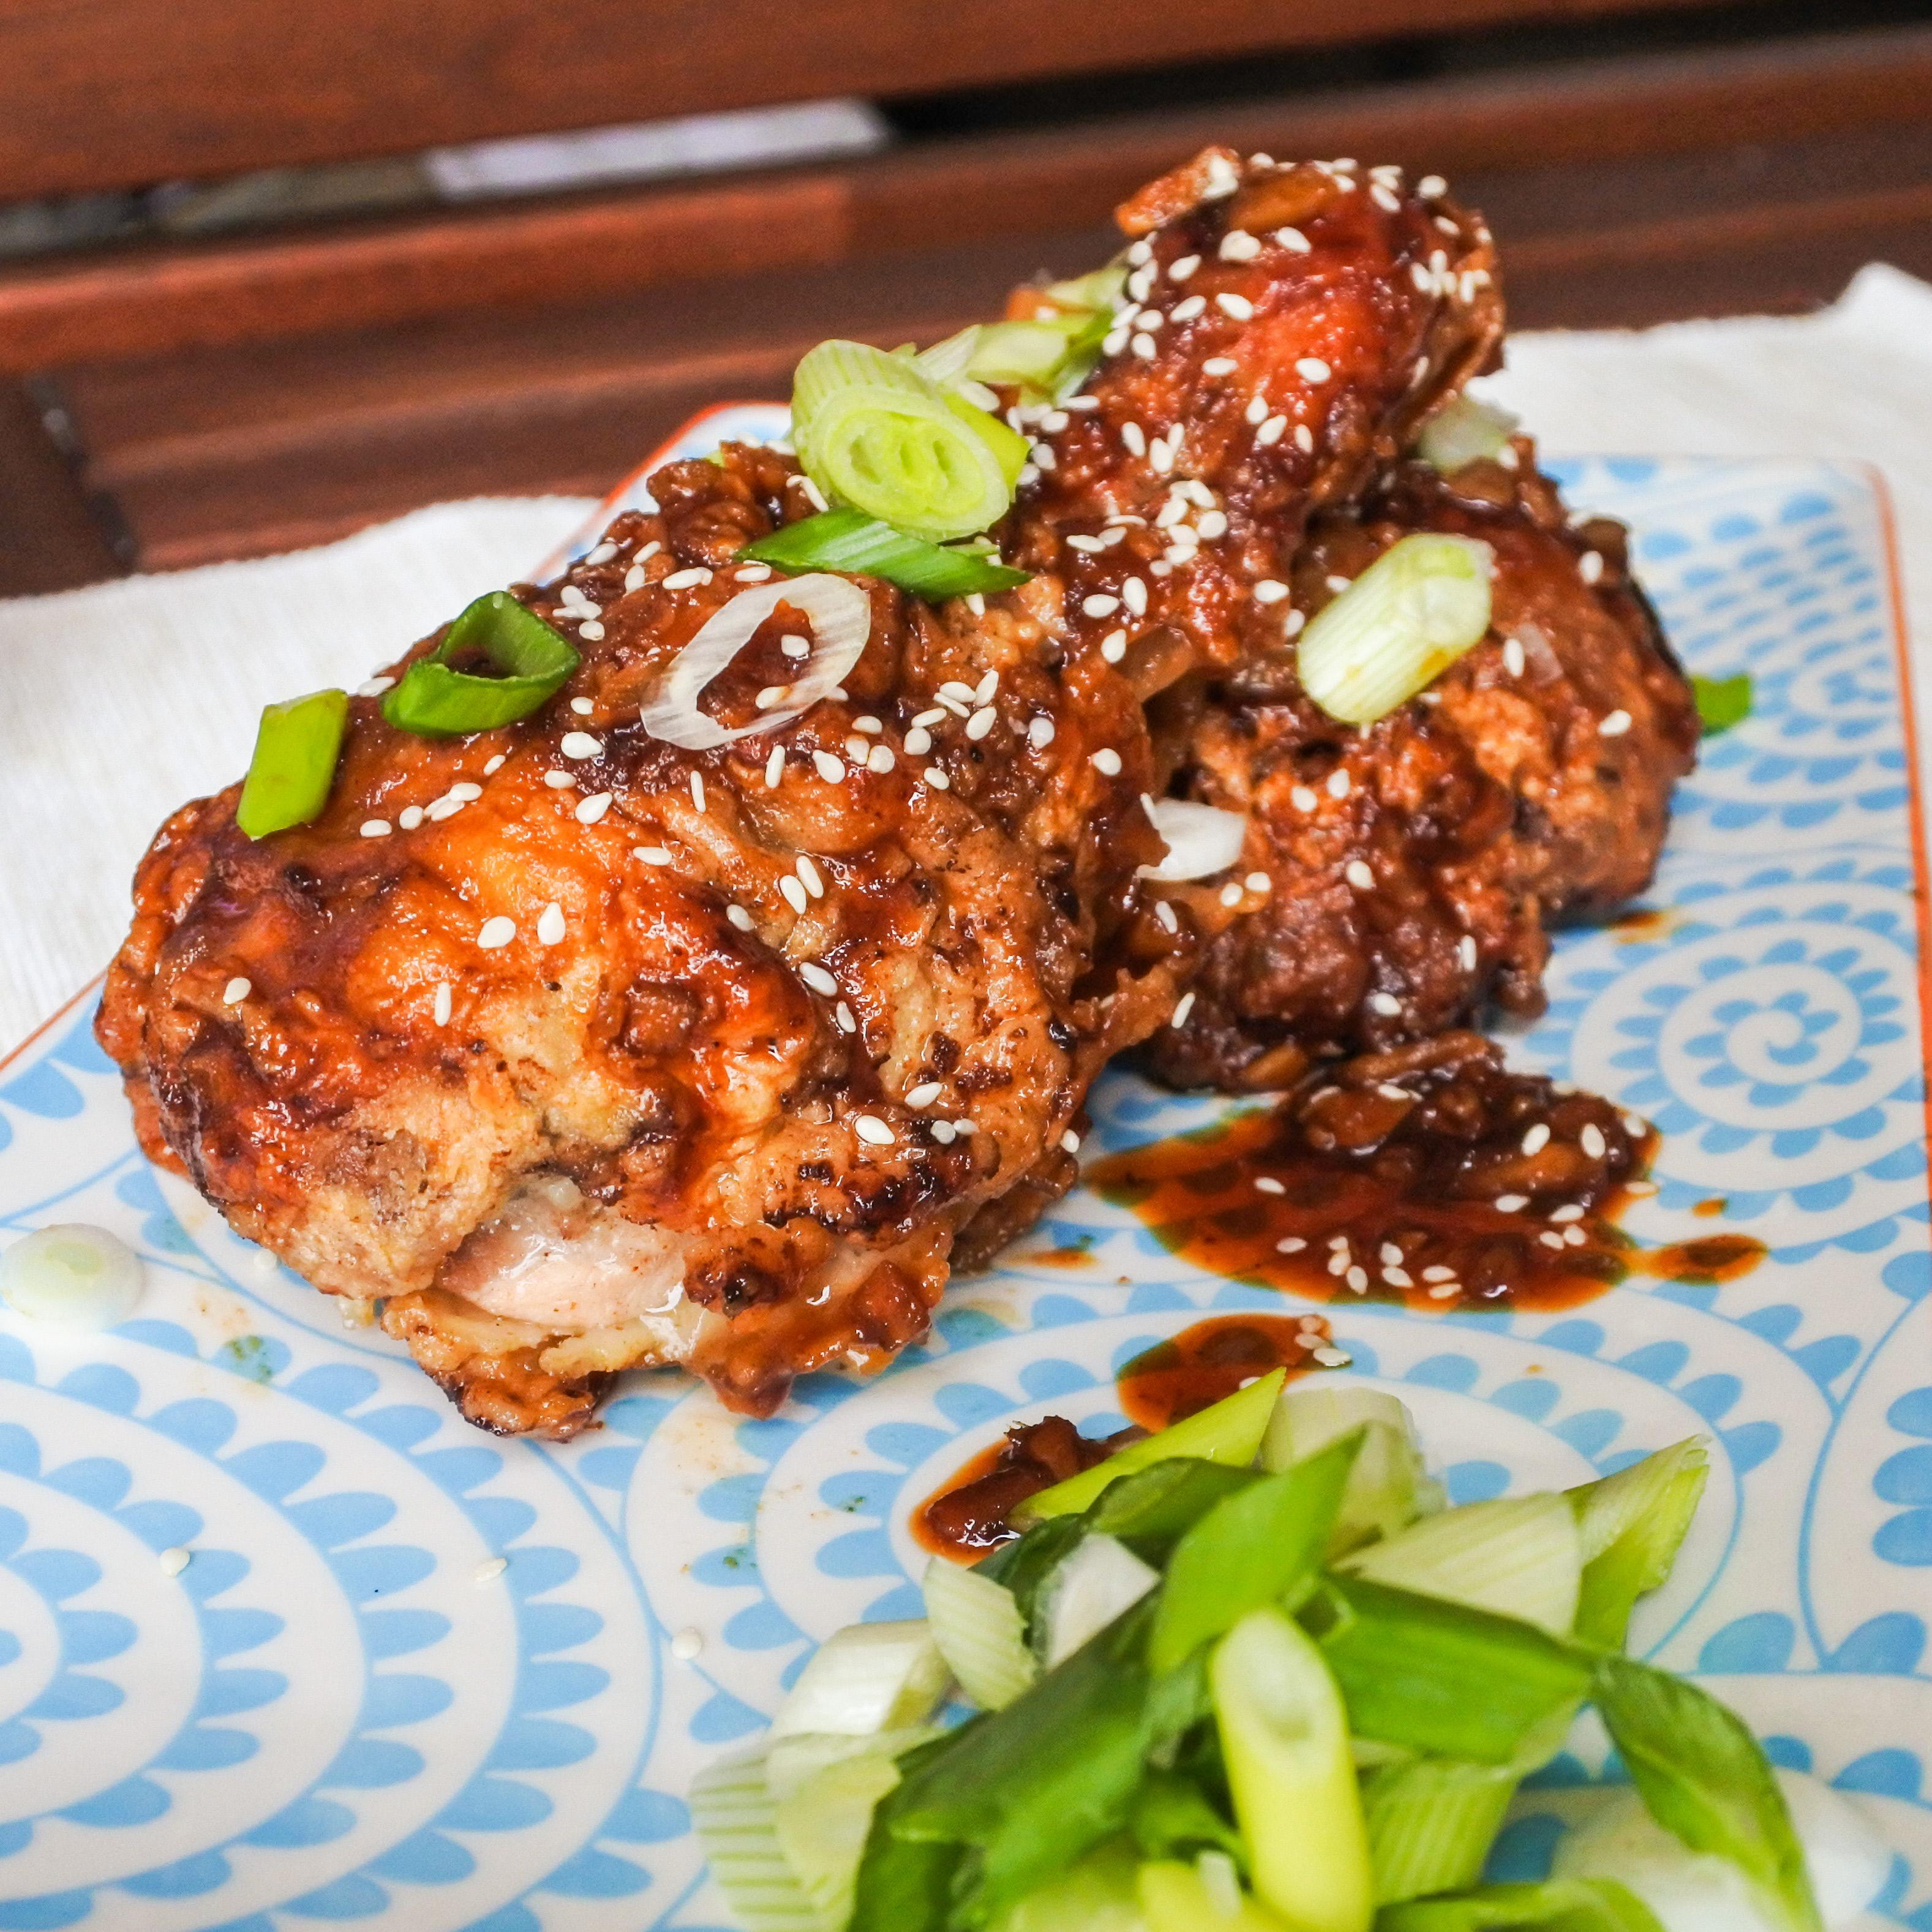 Garlic and ginger fried chicken 7